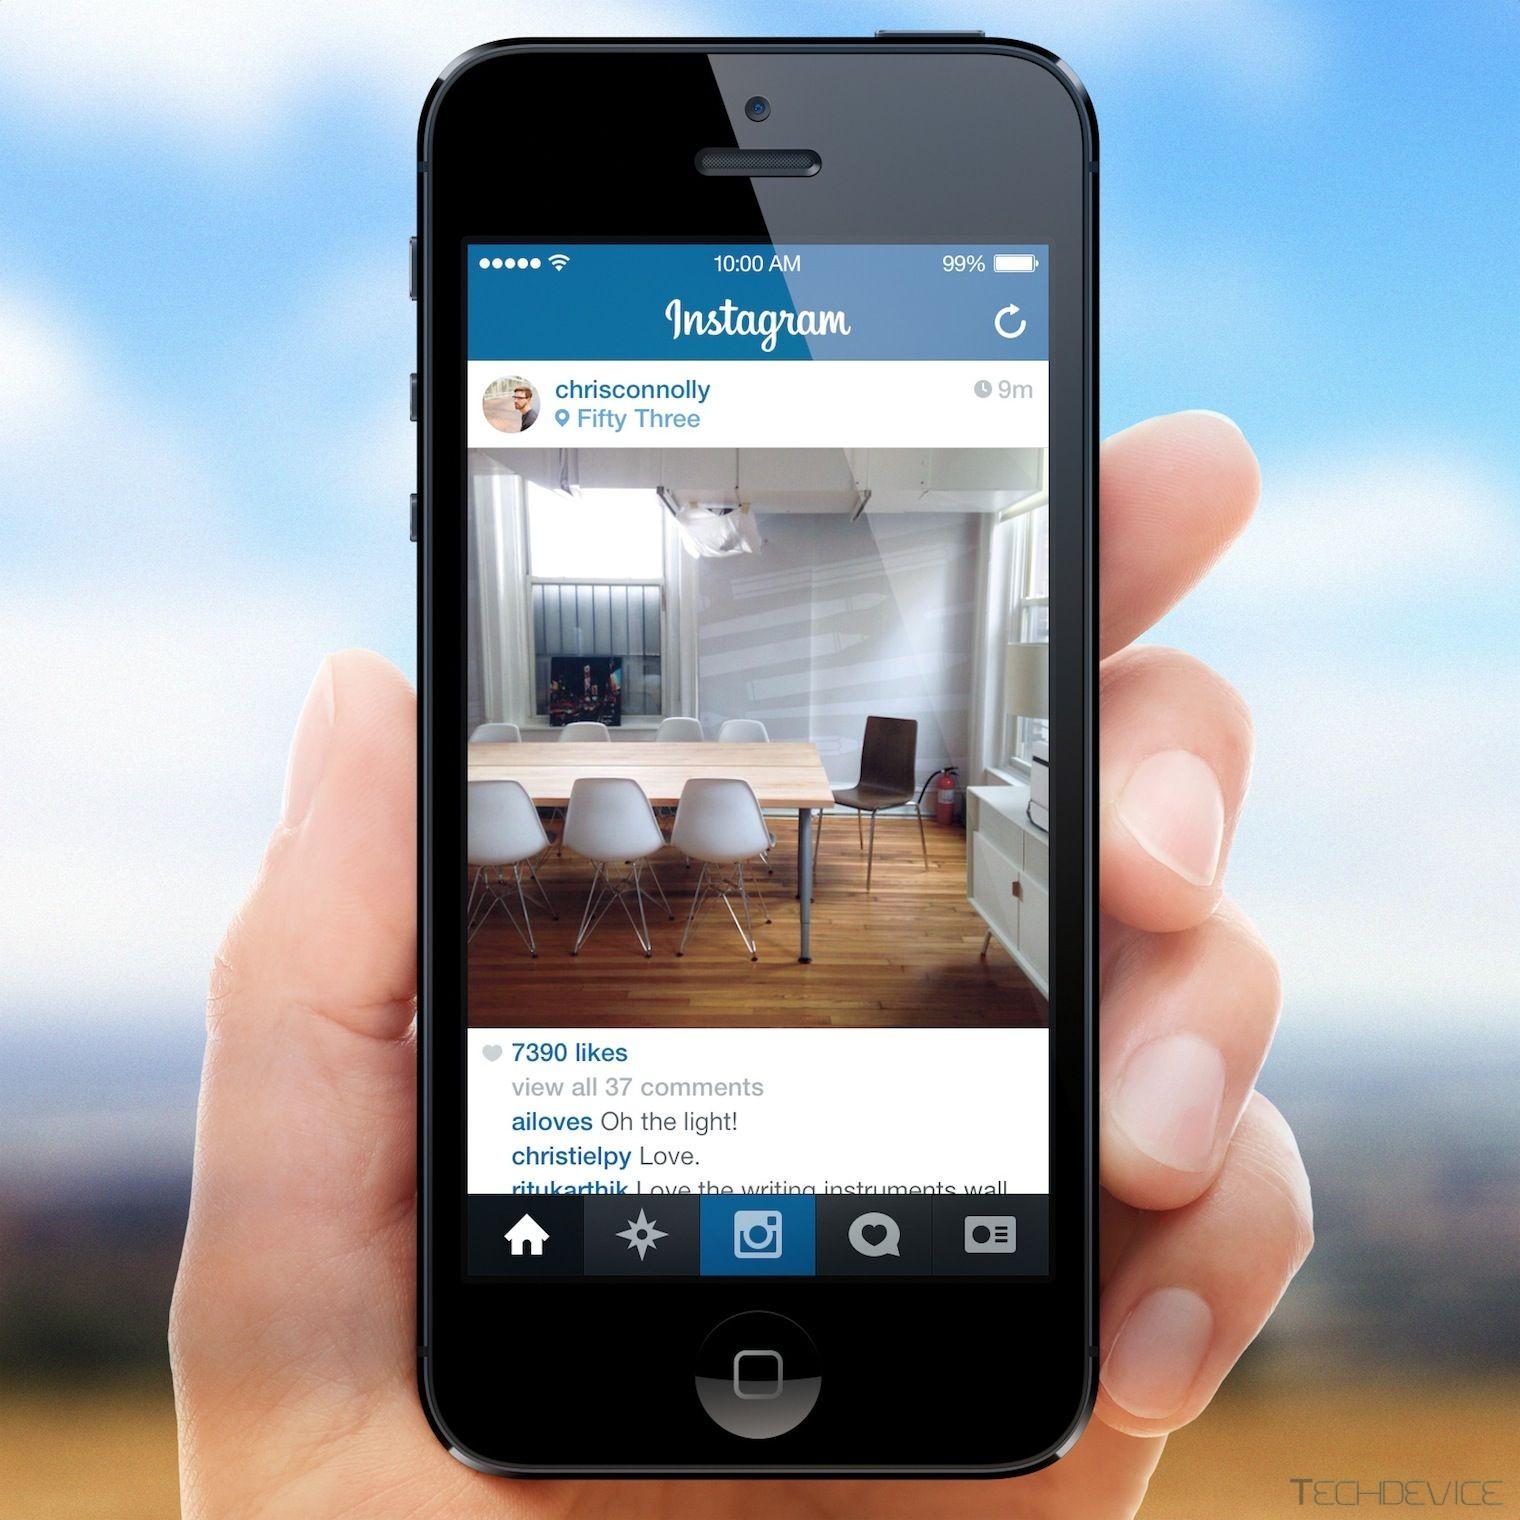 instagram_iOS_iphone_4inch_td